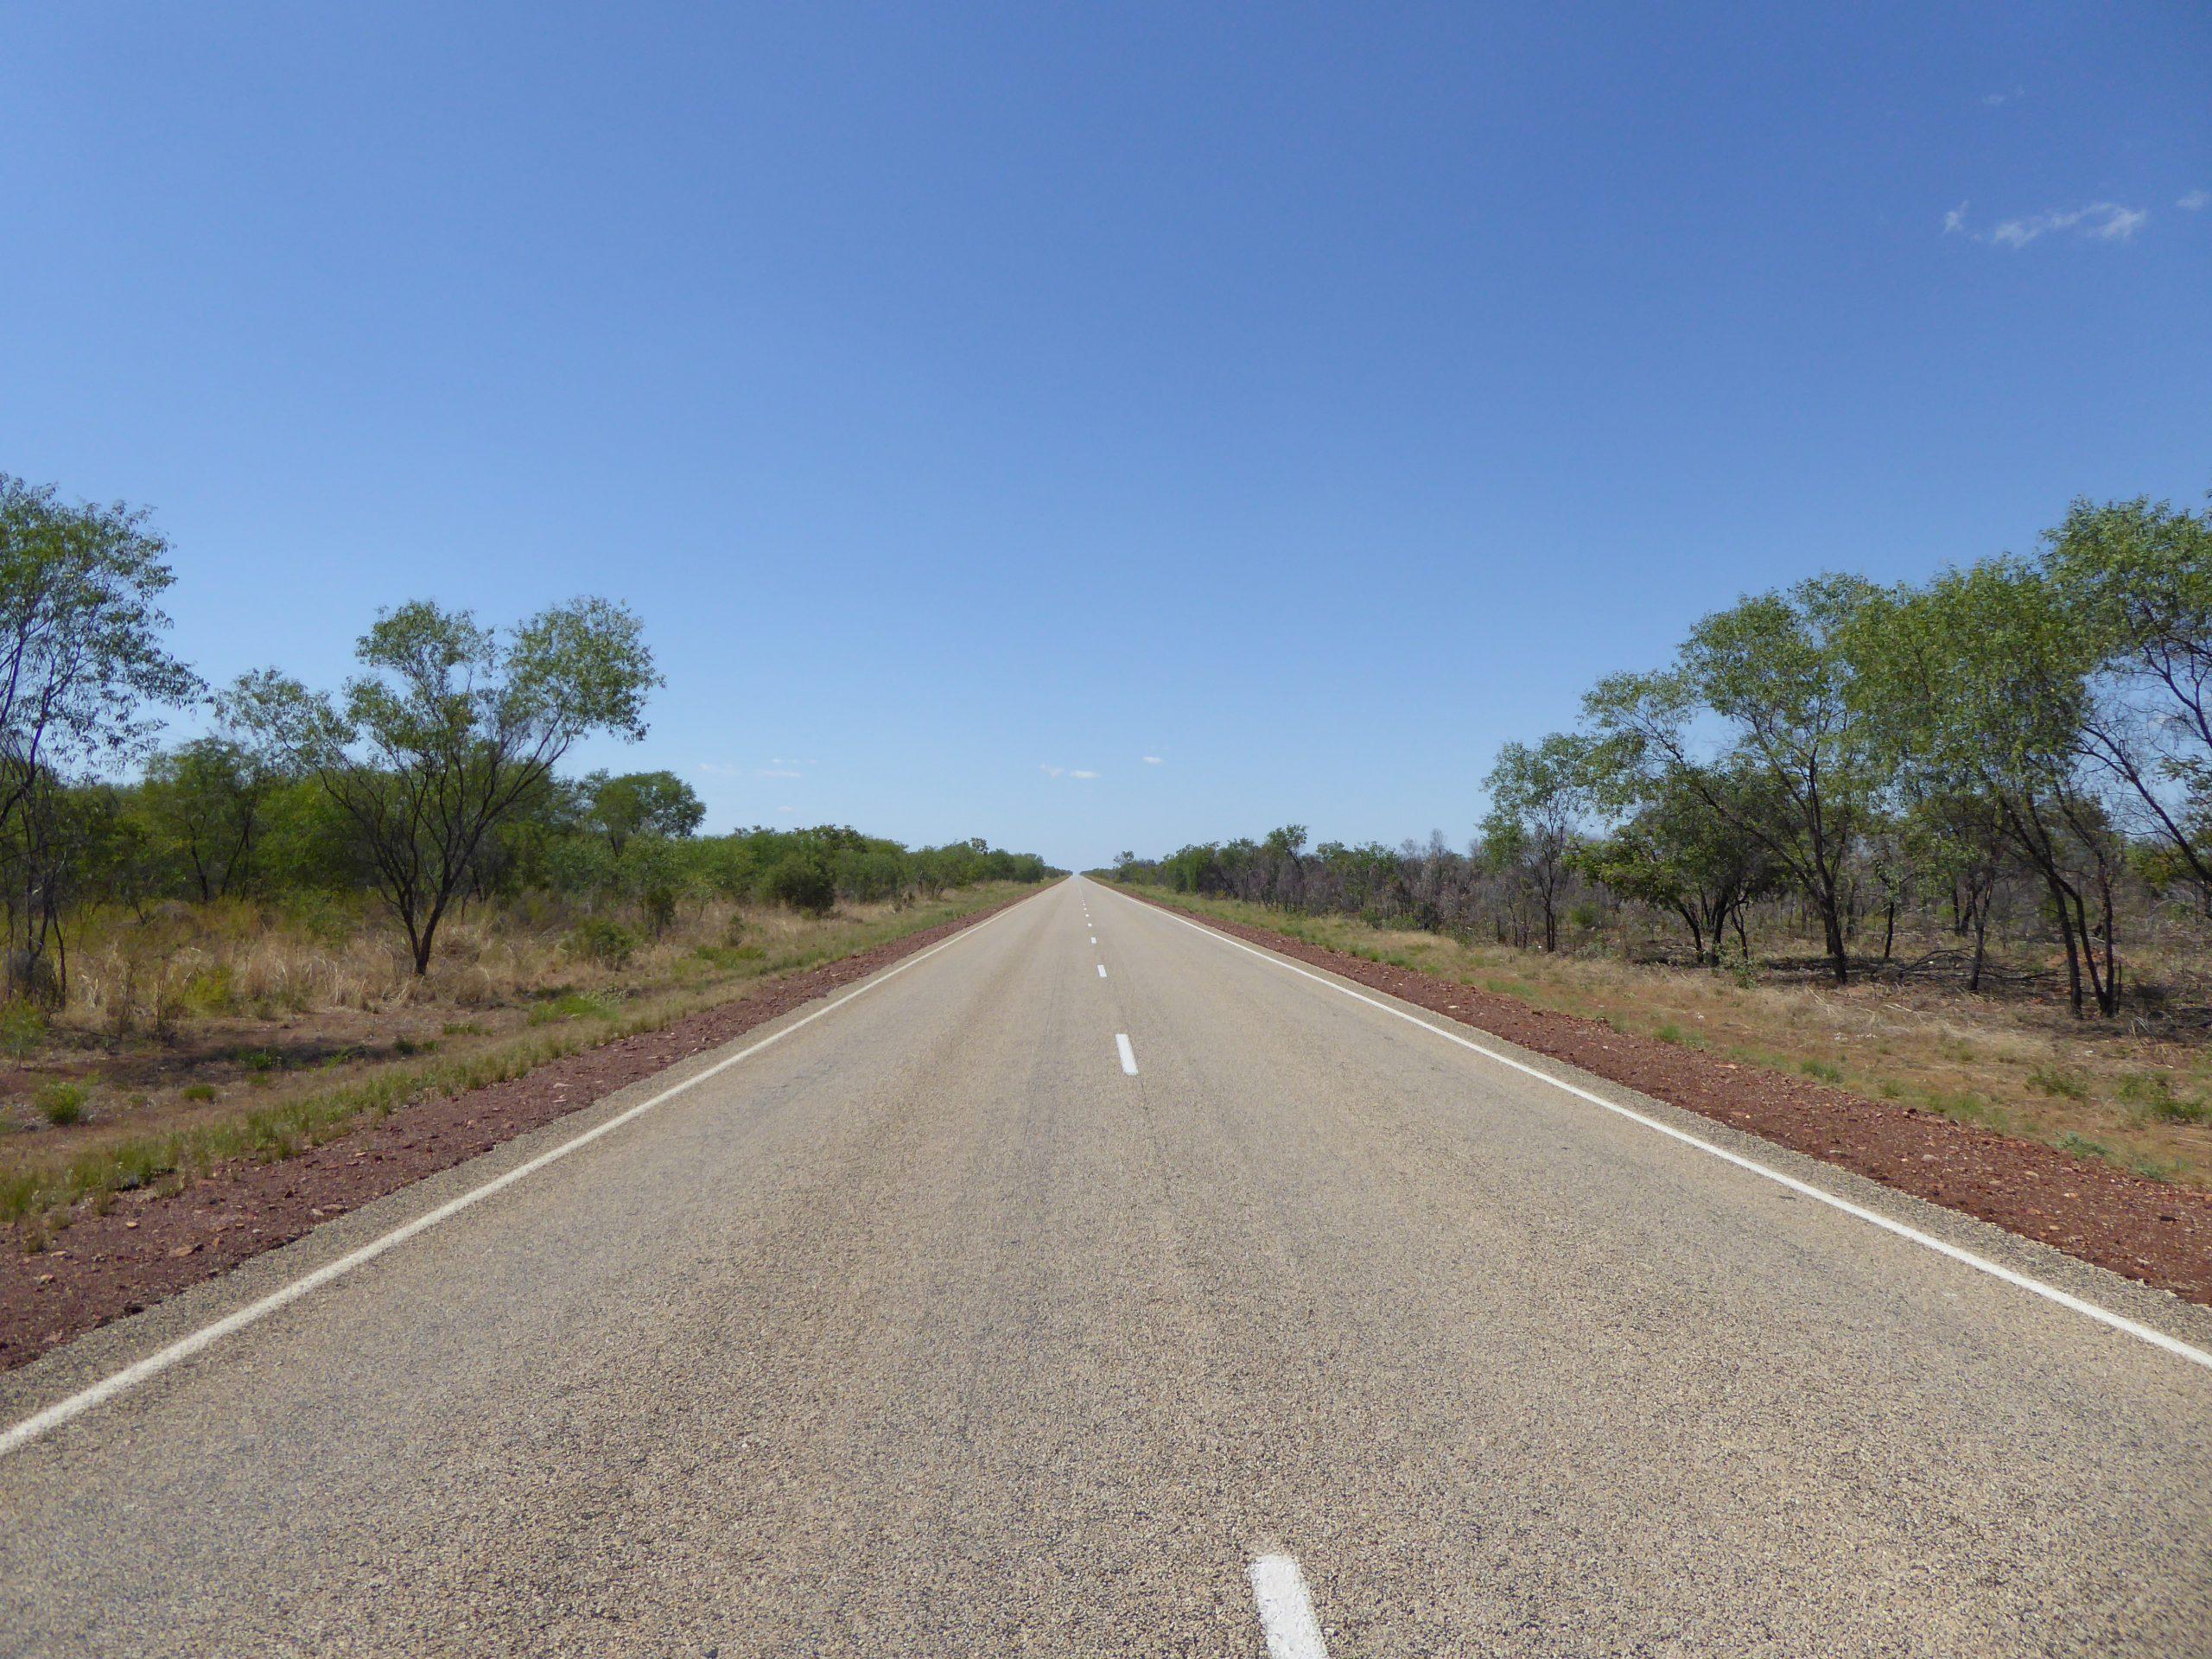 Radreise Australien 2016 - Stuart Highway - Barkly Tableland